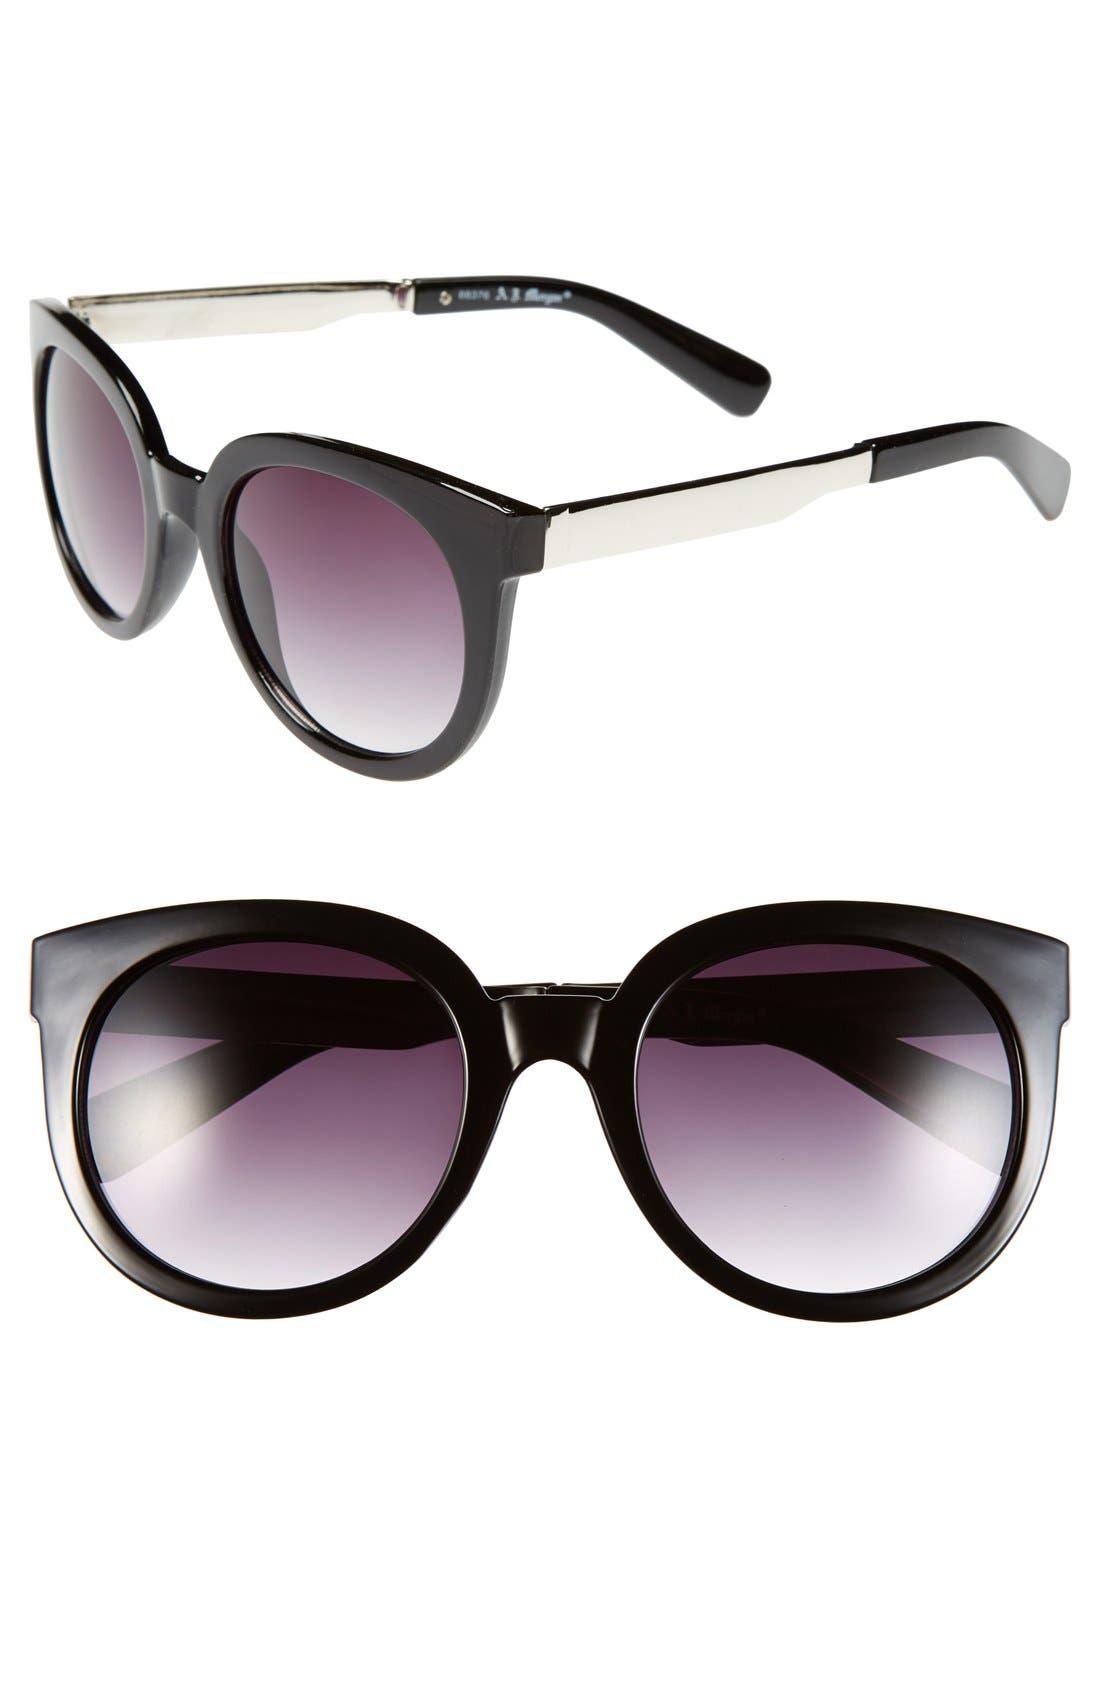 Main Image - A.J. Morgan 'Classy' 50mm Retro Sunglasses